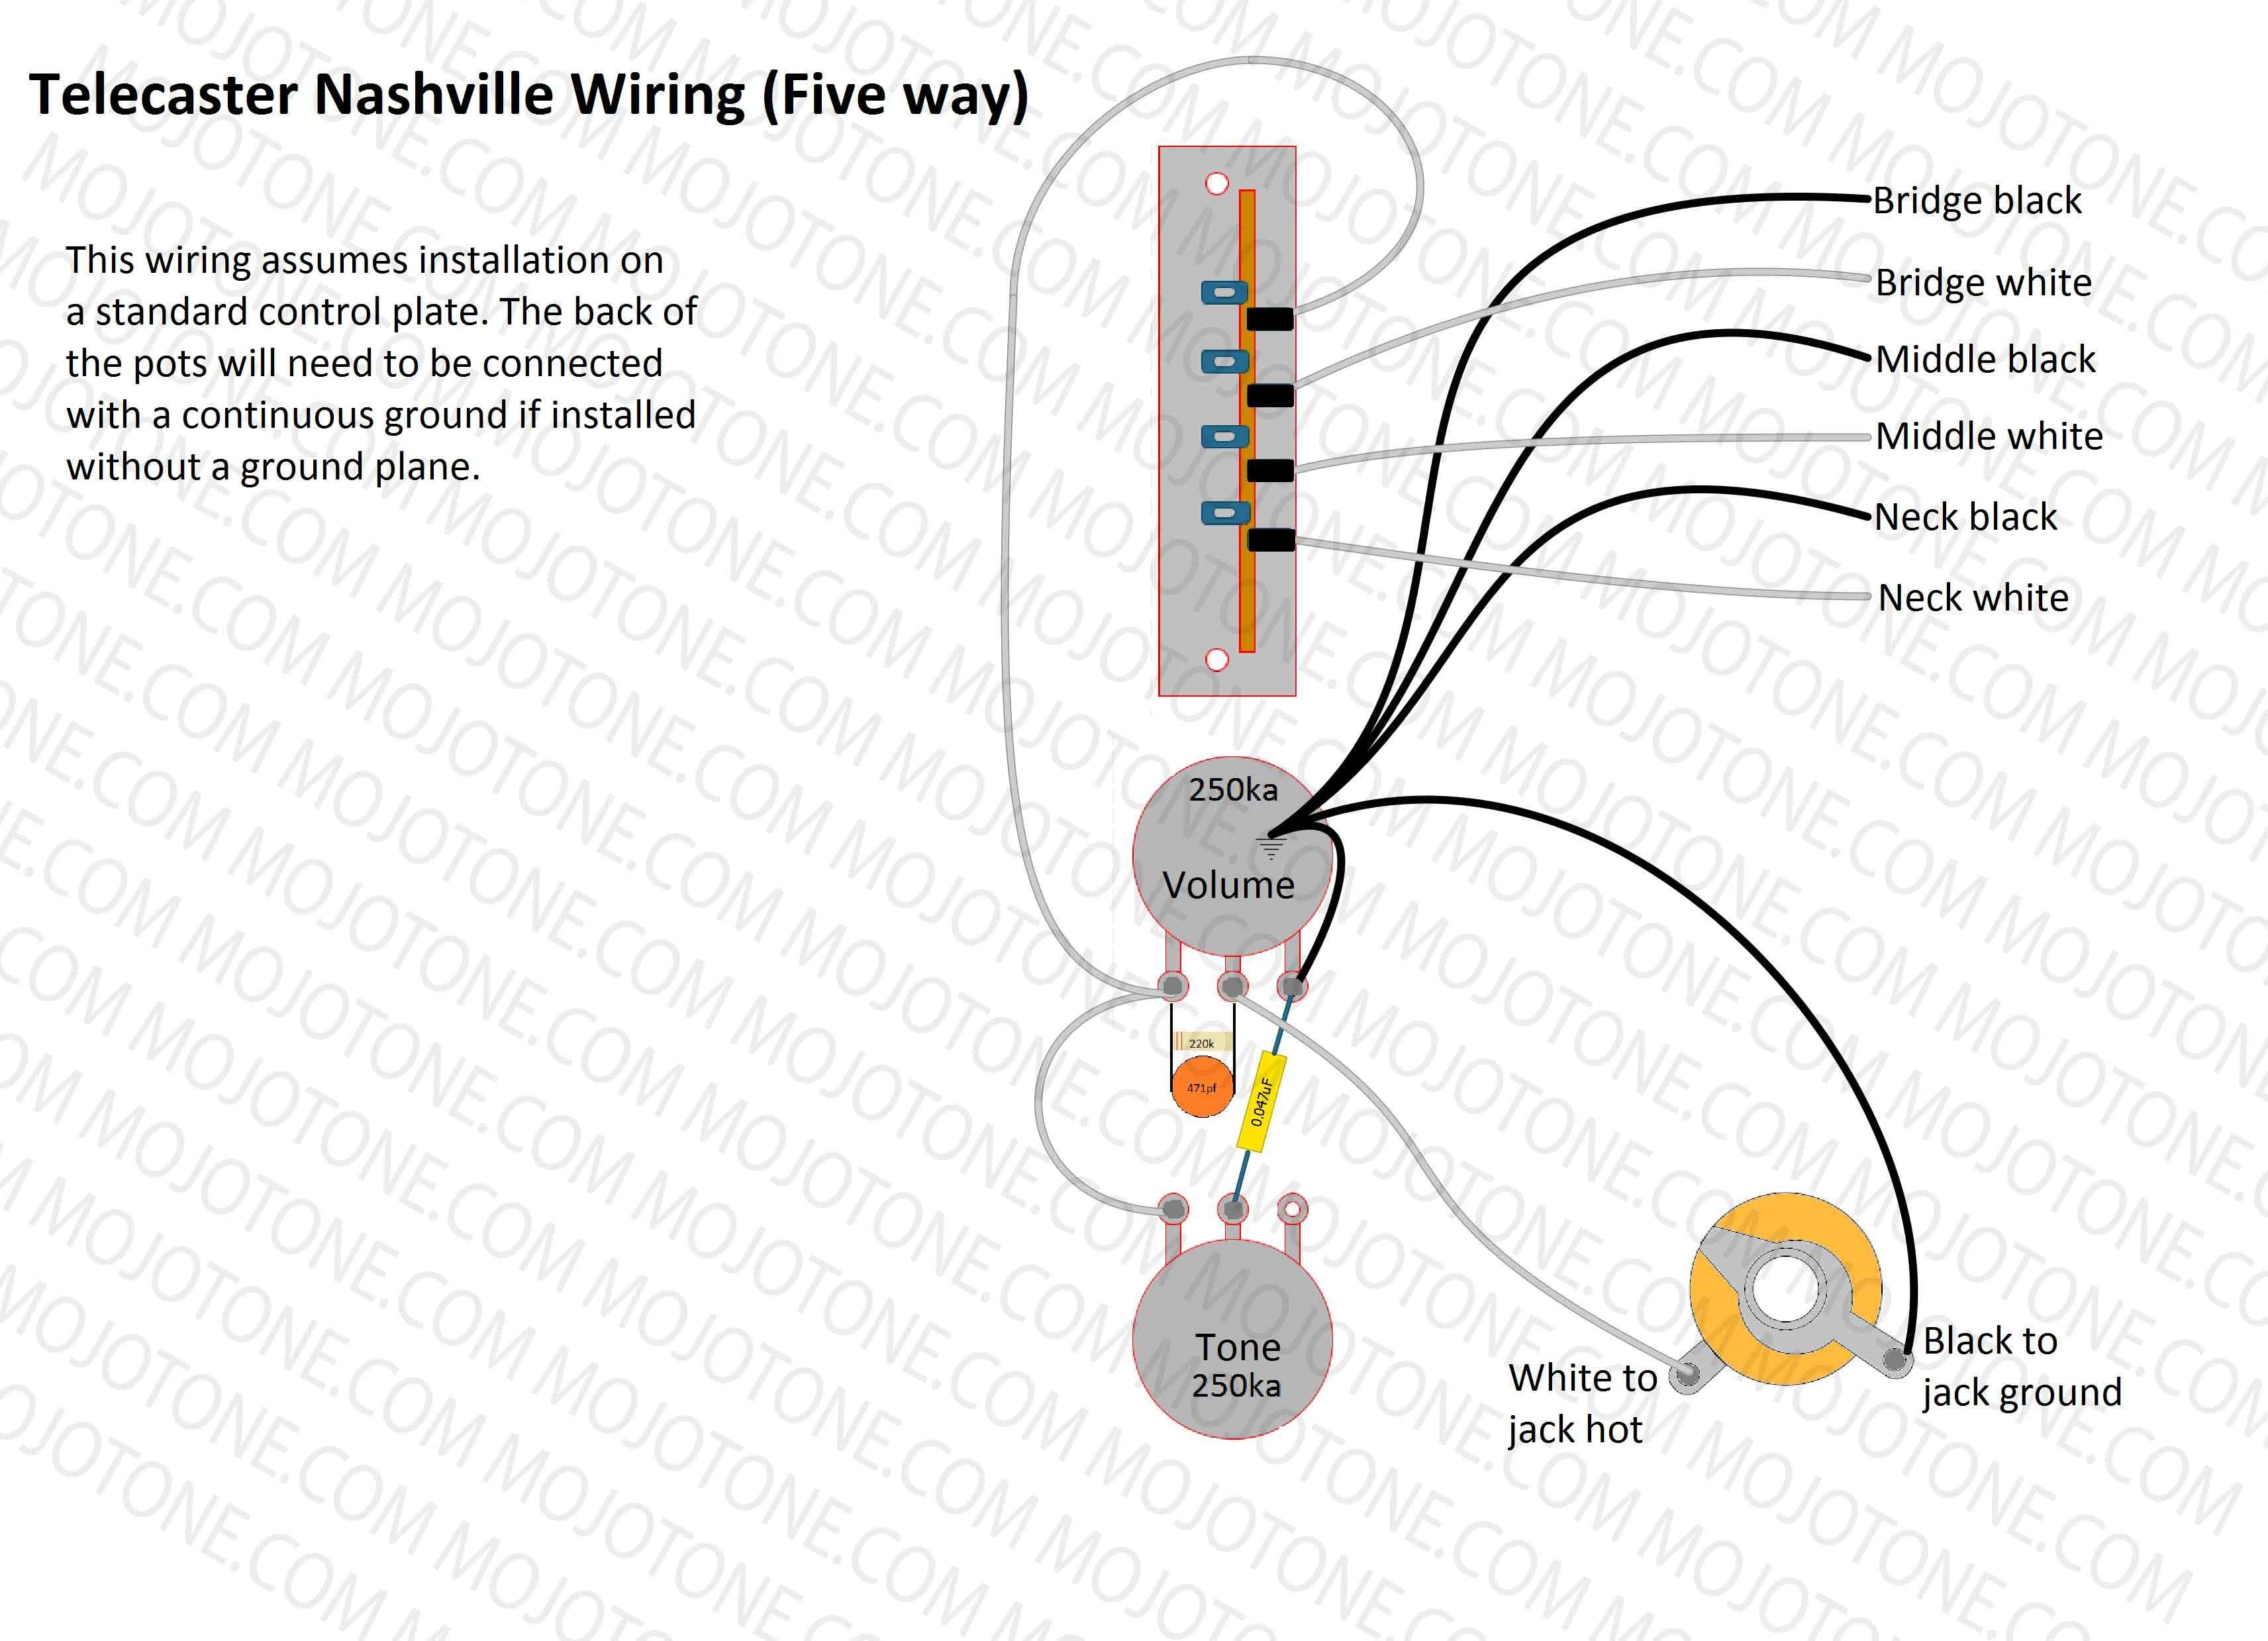 Telecaster Nashville Wiring Diagram Telecaster, Fender